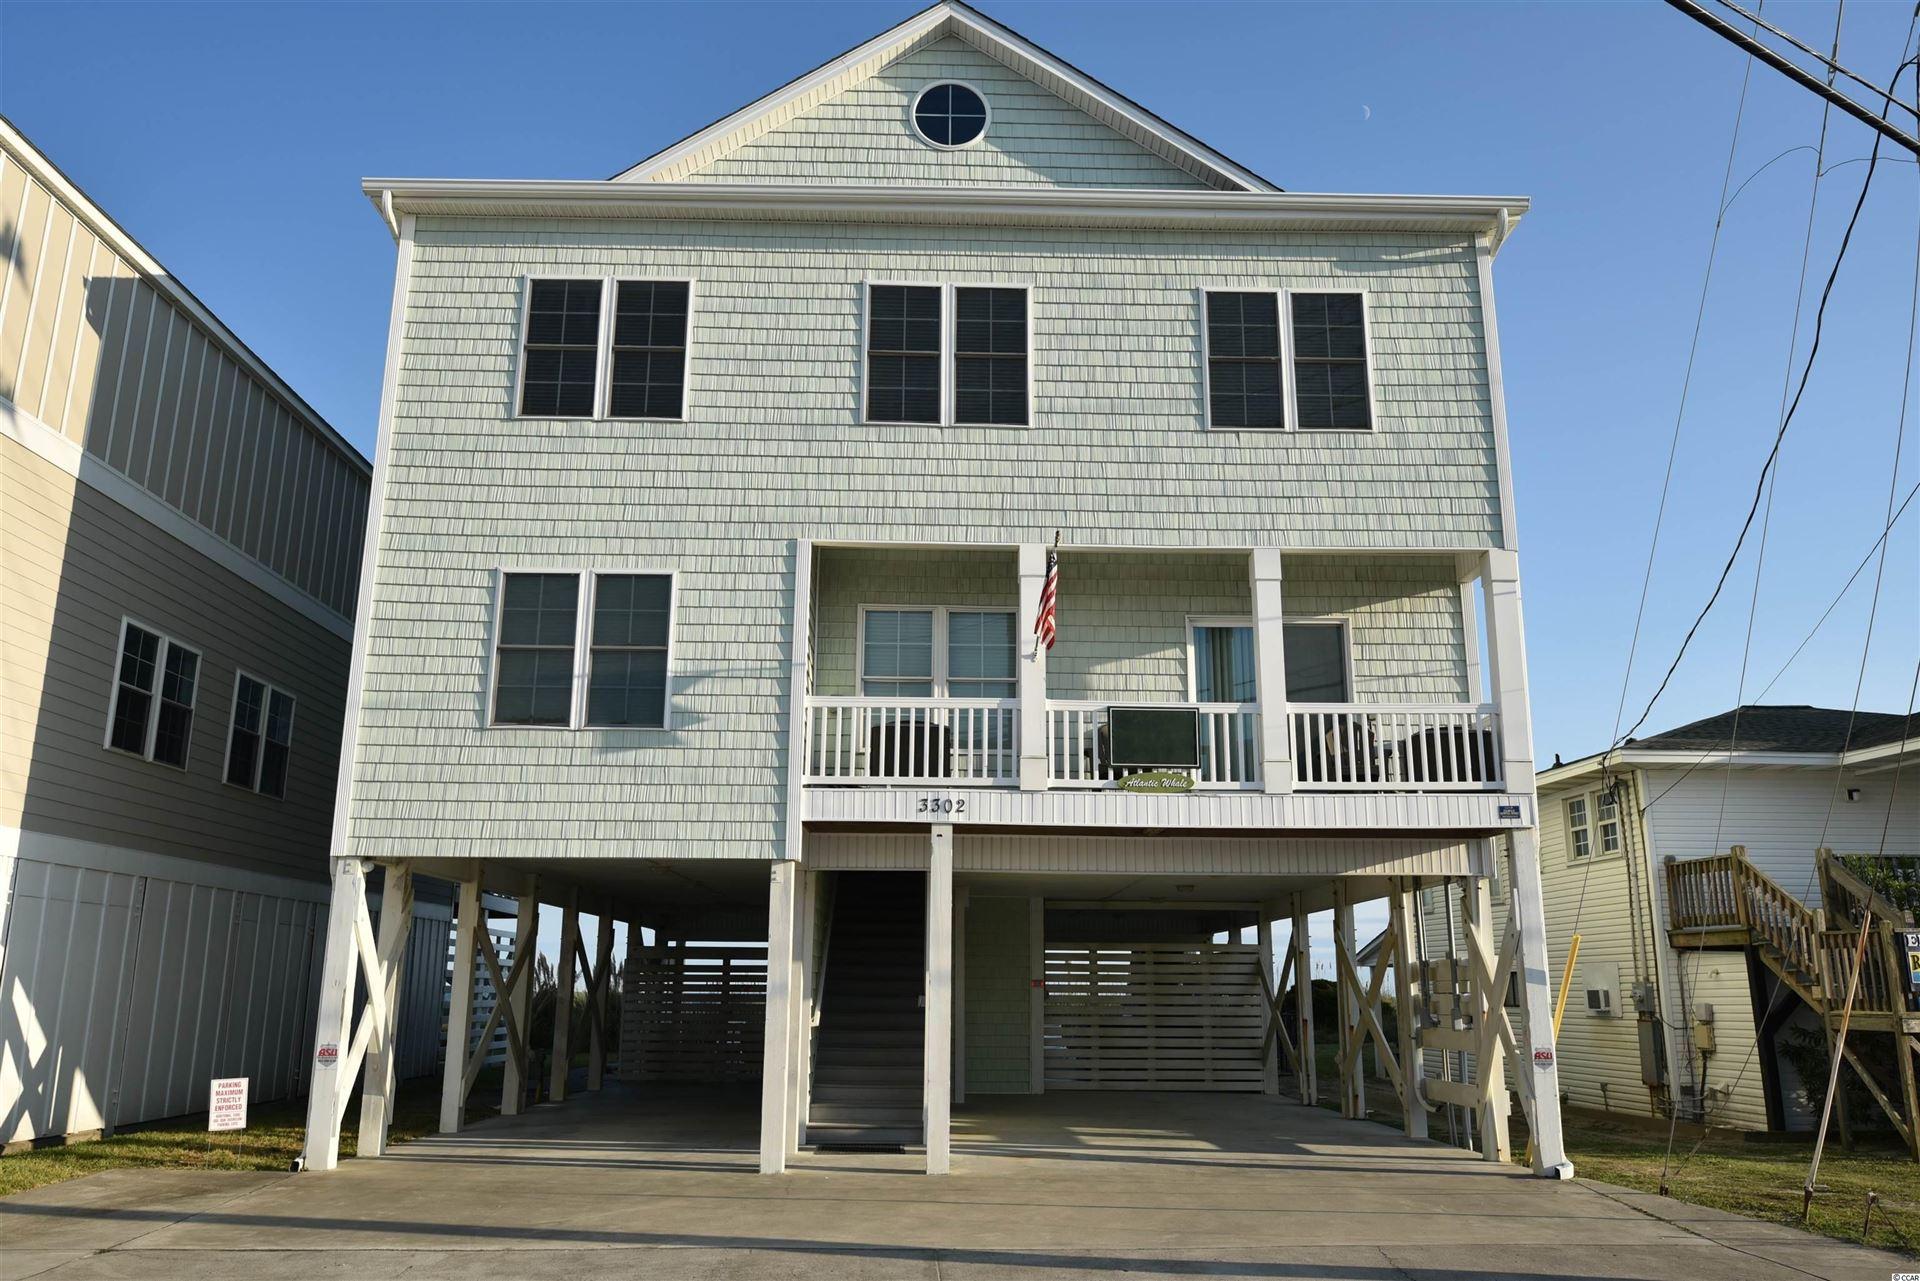 3302 N Ocean Blvd., North Myrtle Beach, SC 29582 - MLS#: 2120491